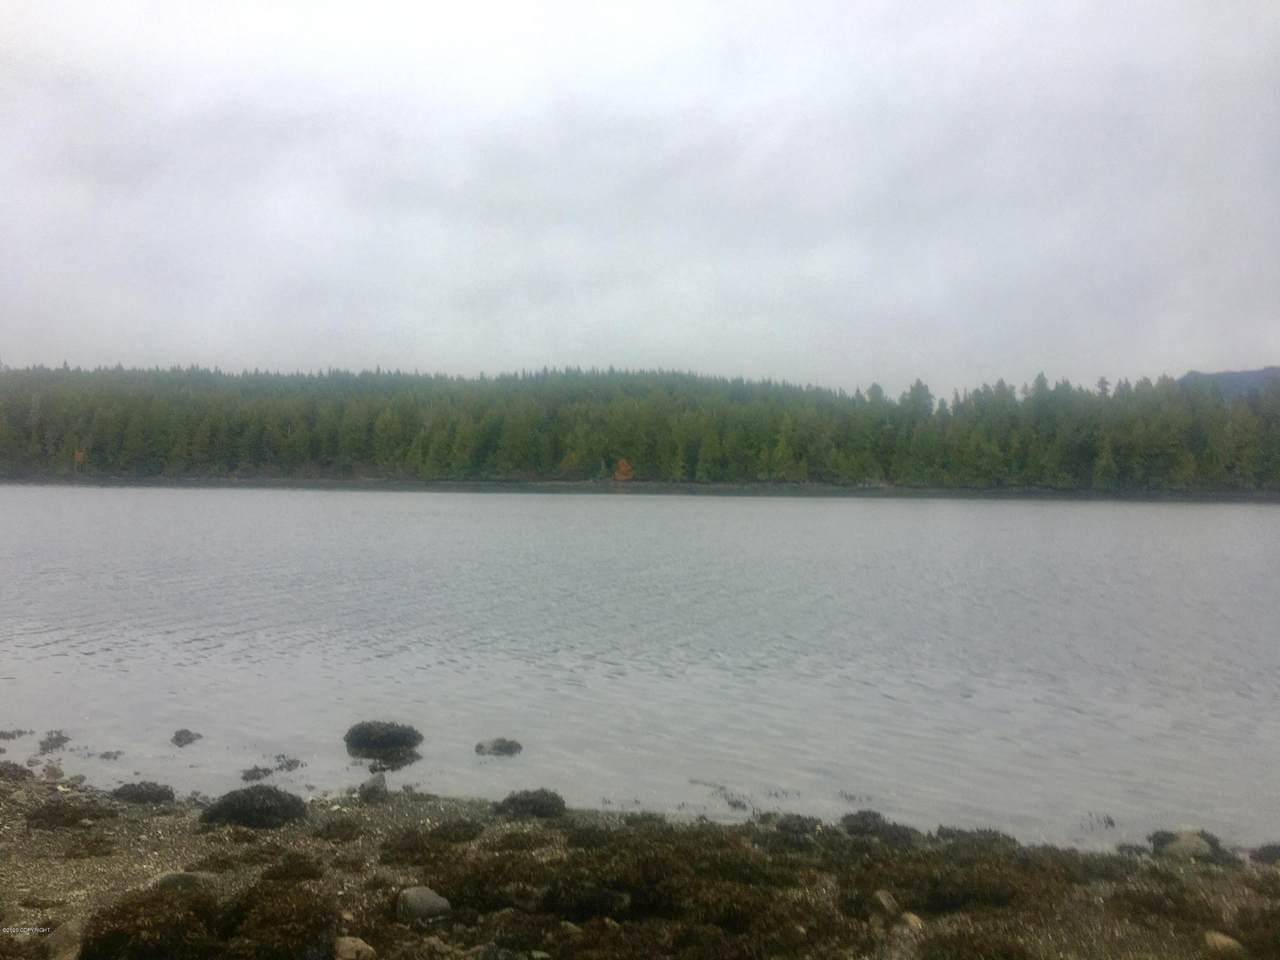 https://bt-photos.global.ssl.fastly.net/alaska/1280_boomver_1_20-17573-2.jpg